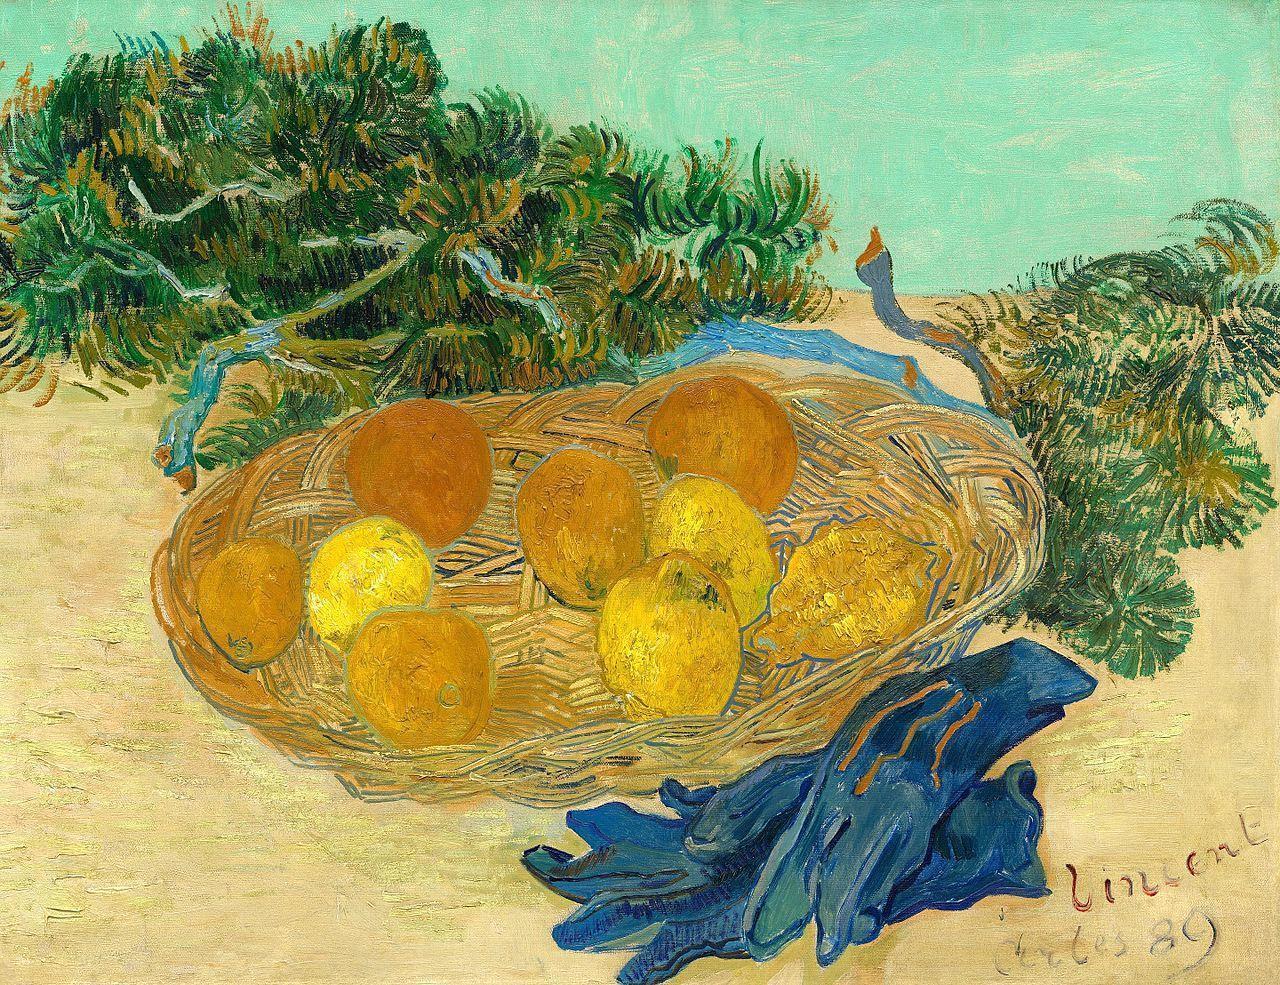 油画静物_橙子、柠檬和蓝色手套静物组合_Still Life with Oranges and Lemons with Blue Gloves-文森特·梵高